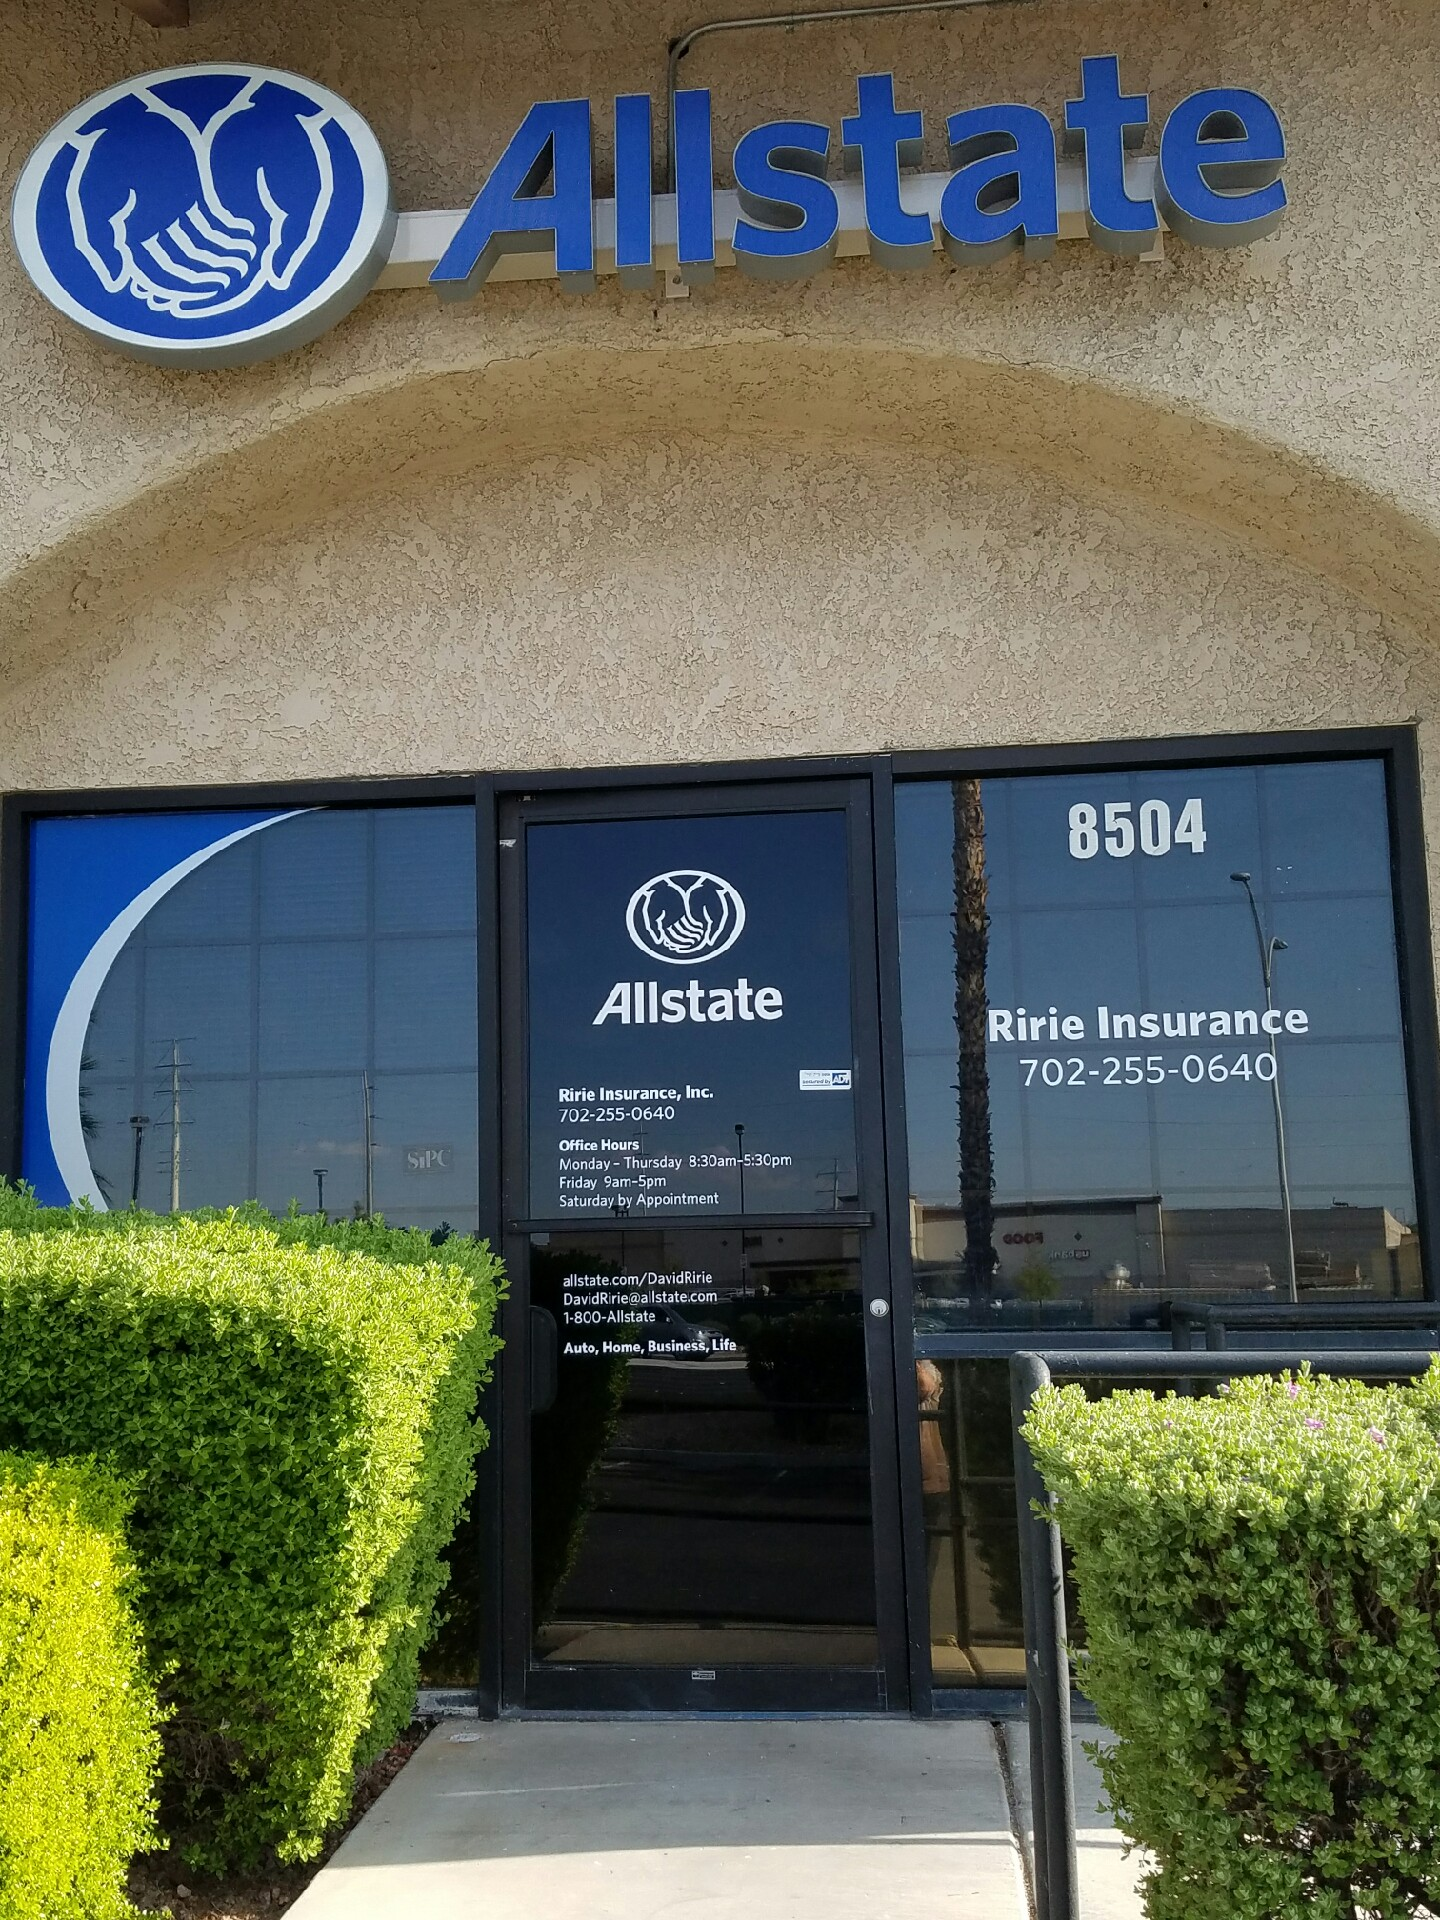 David Ririe: Allstate Insurance image 1